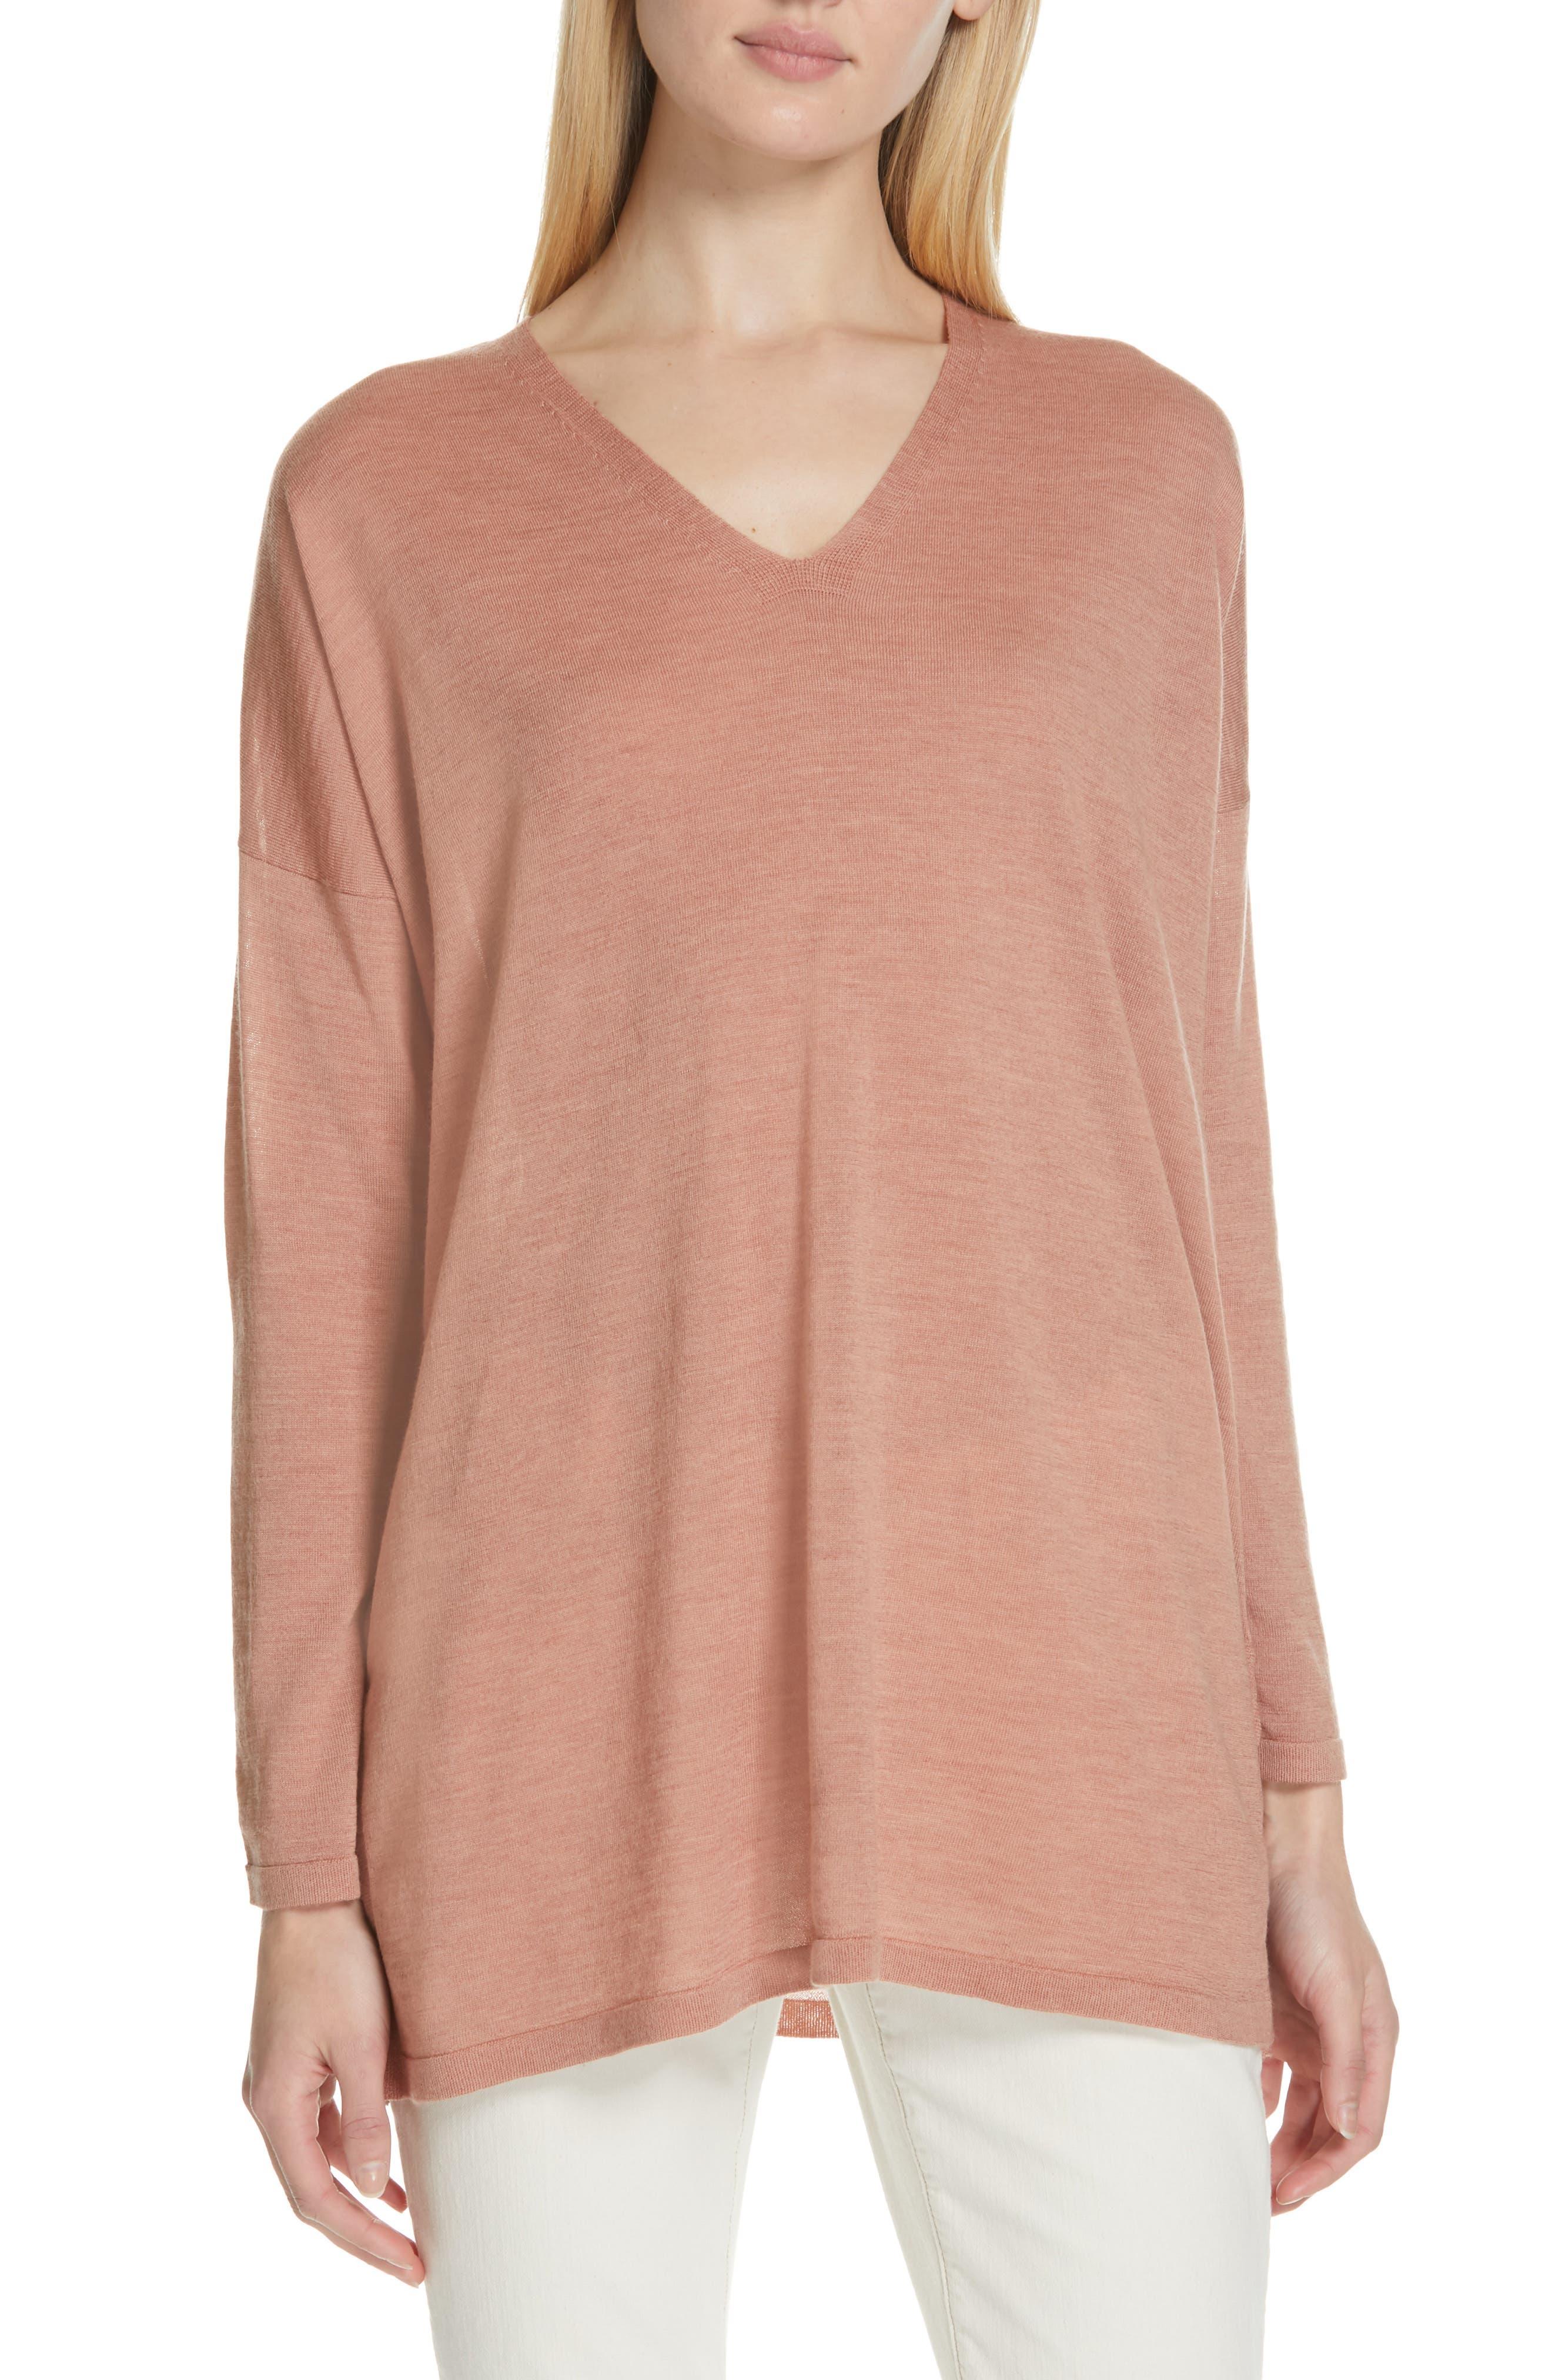 Eileen Fisher Merino Wool Tunic Sweater, Beige